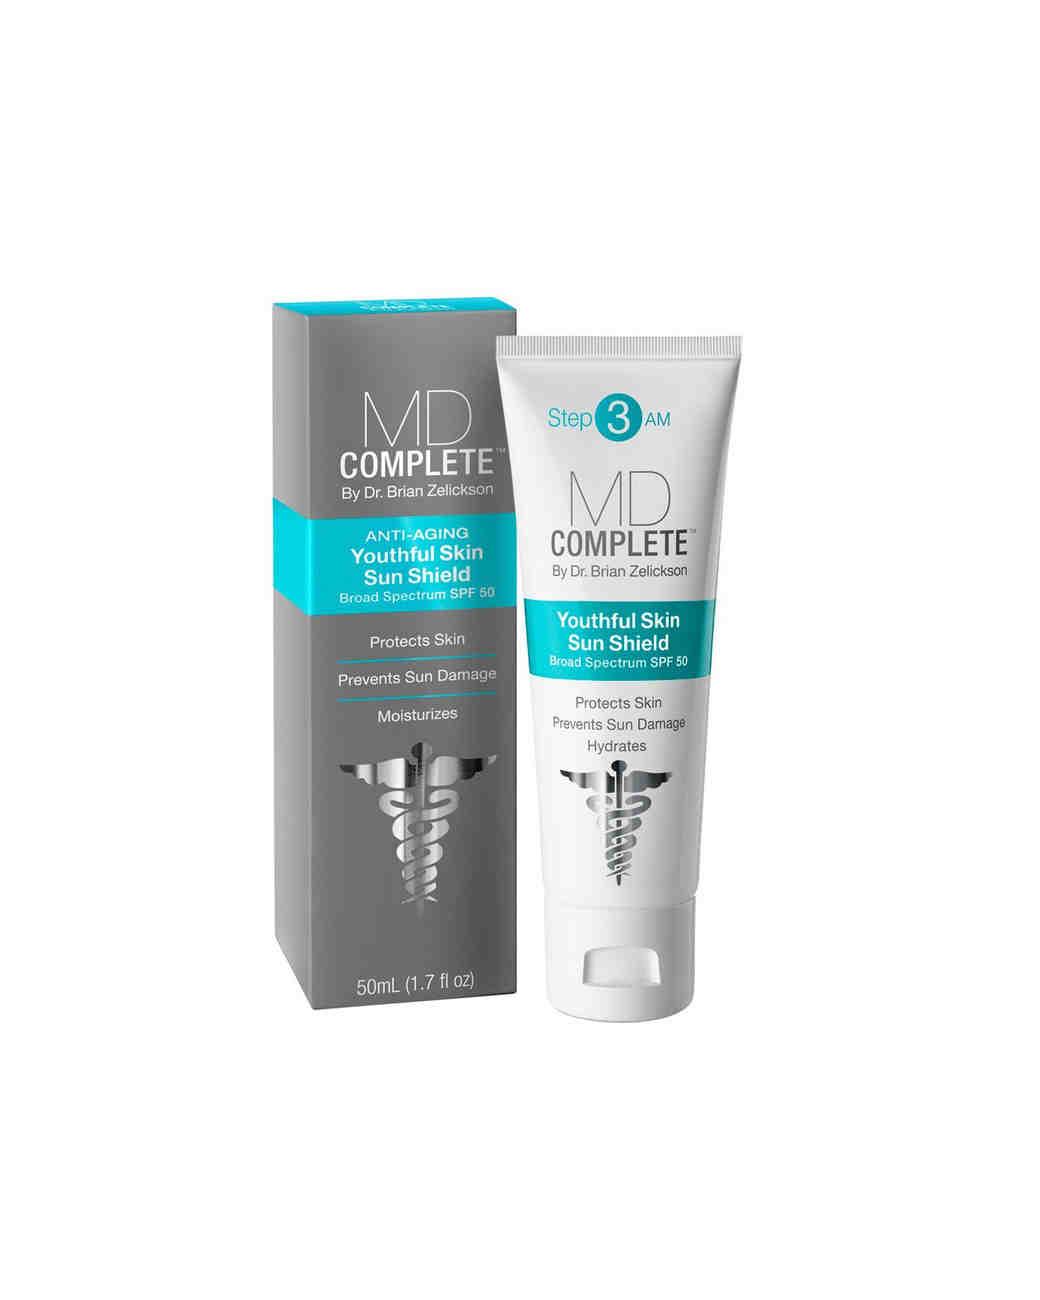 MD Complete Youthful Skin Sun Shielf SPF 50